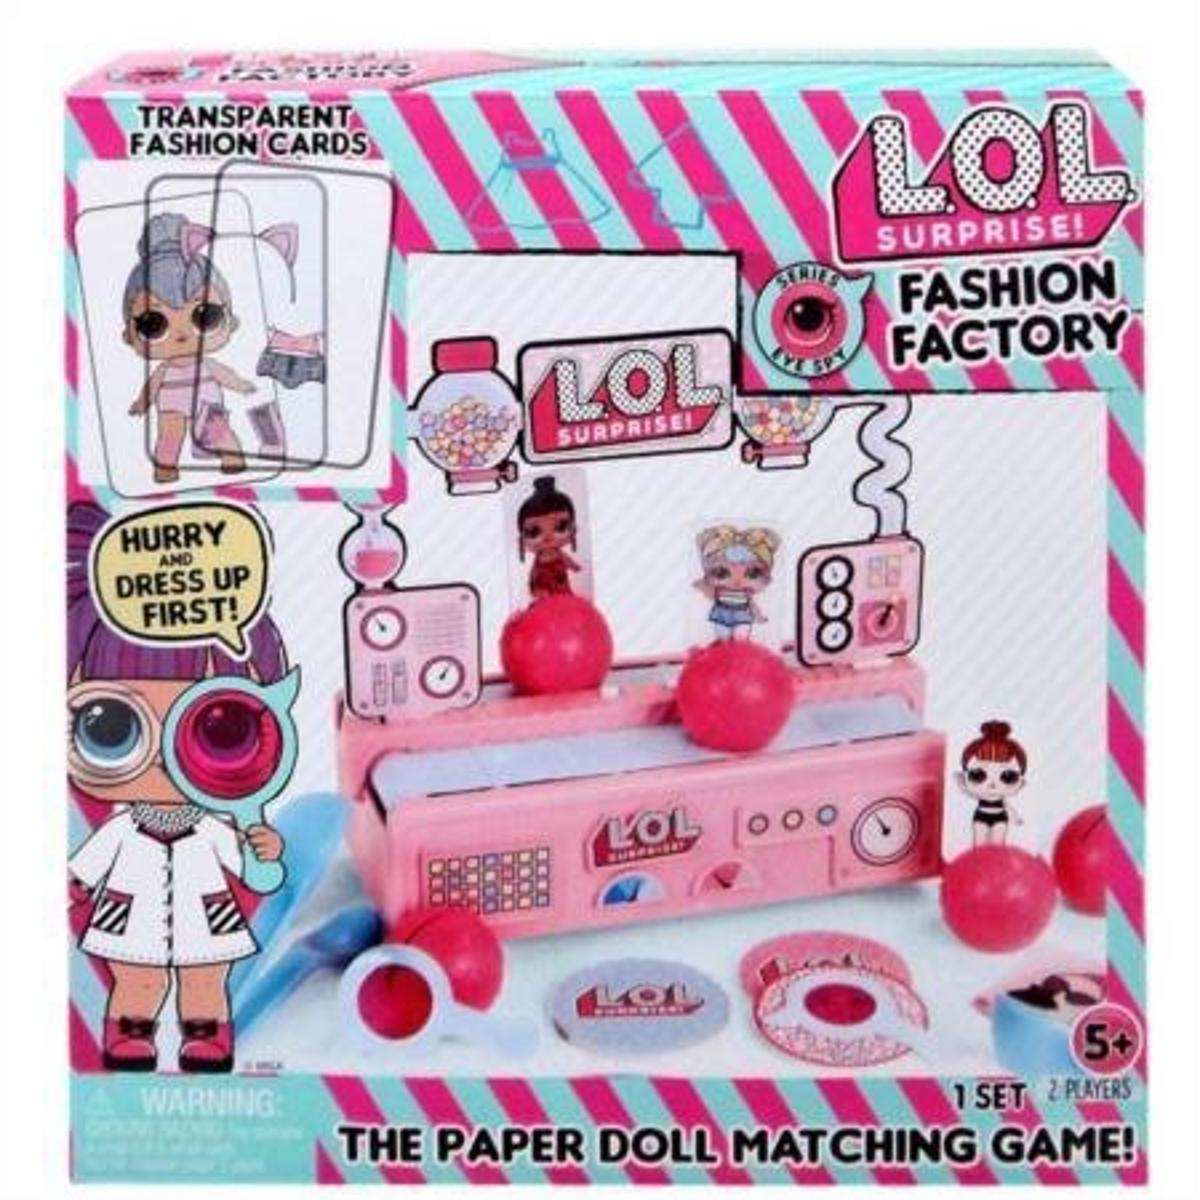 L.O.L Surprise! Fashion Factory Game